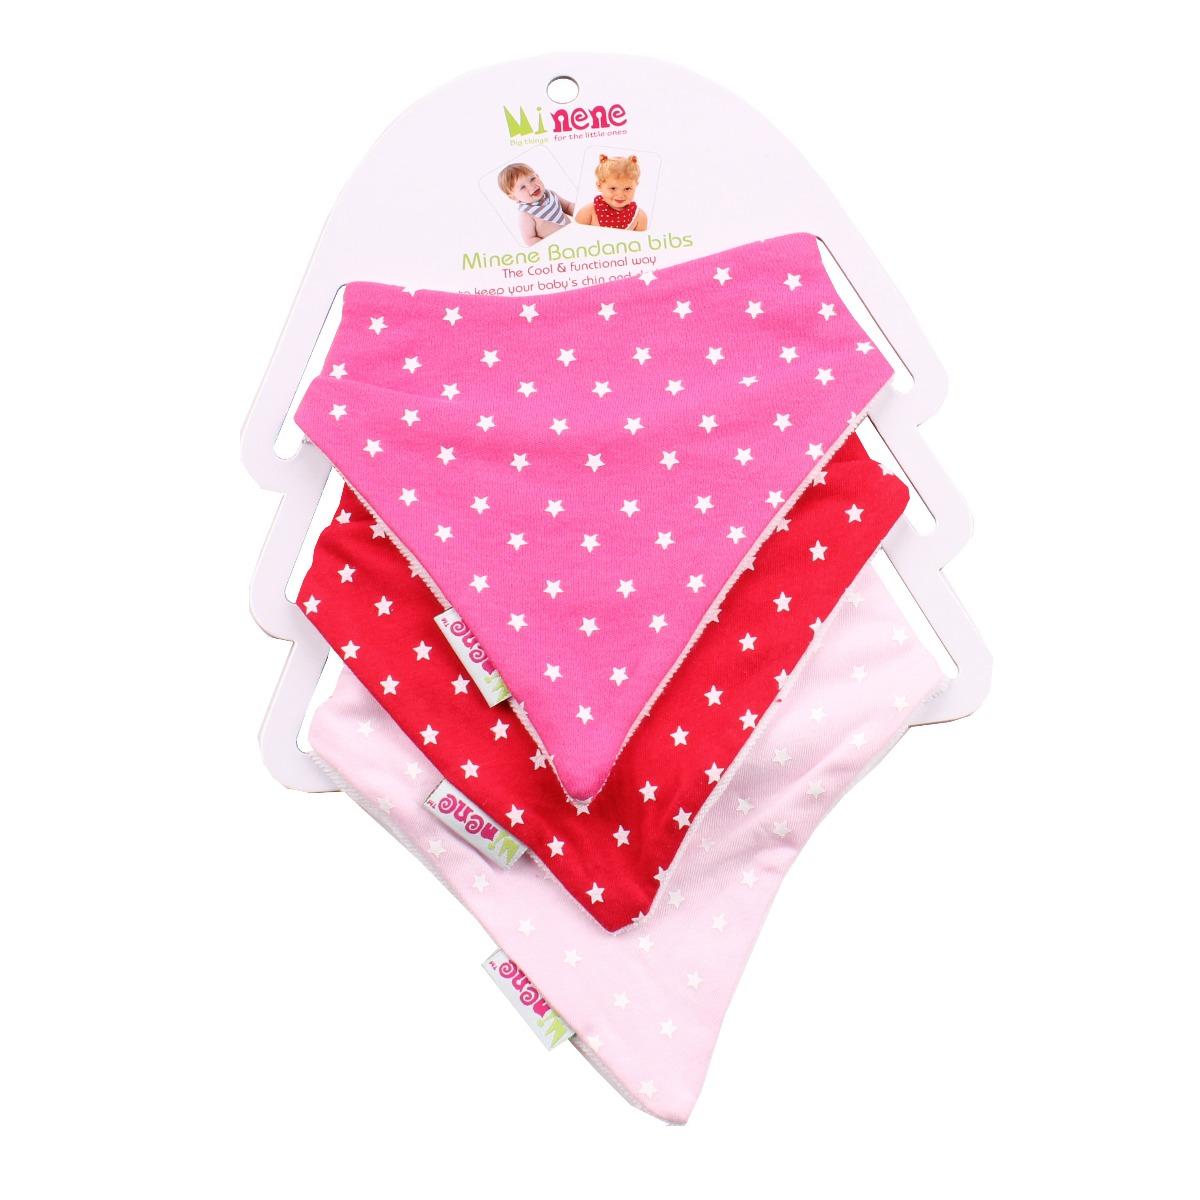 Set 3 bavetele triunghiulare cu stelute pentru bebelusi Minene, Roz imagine